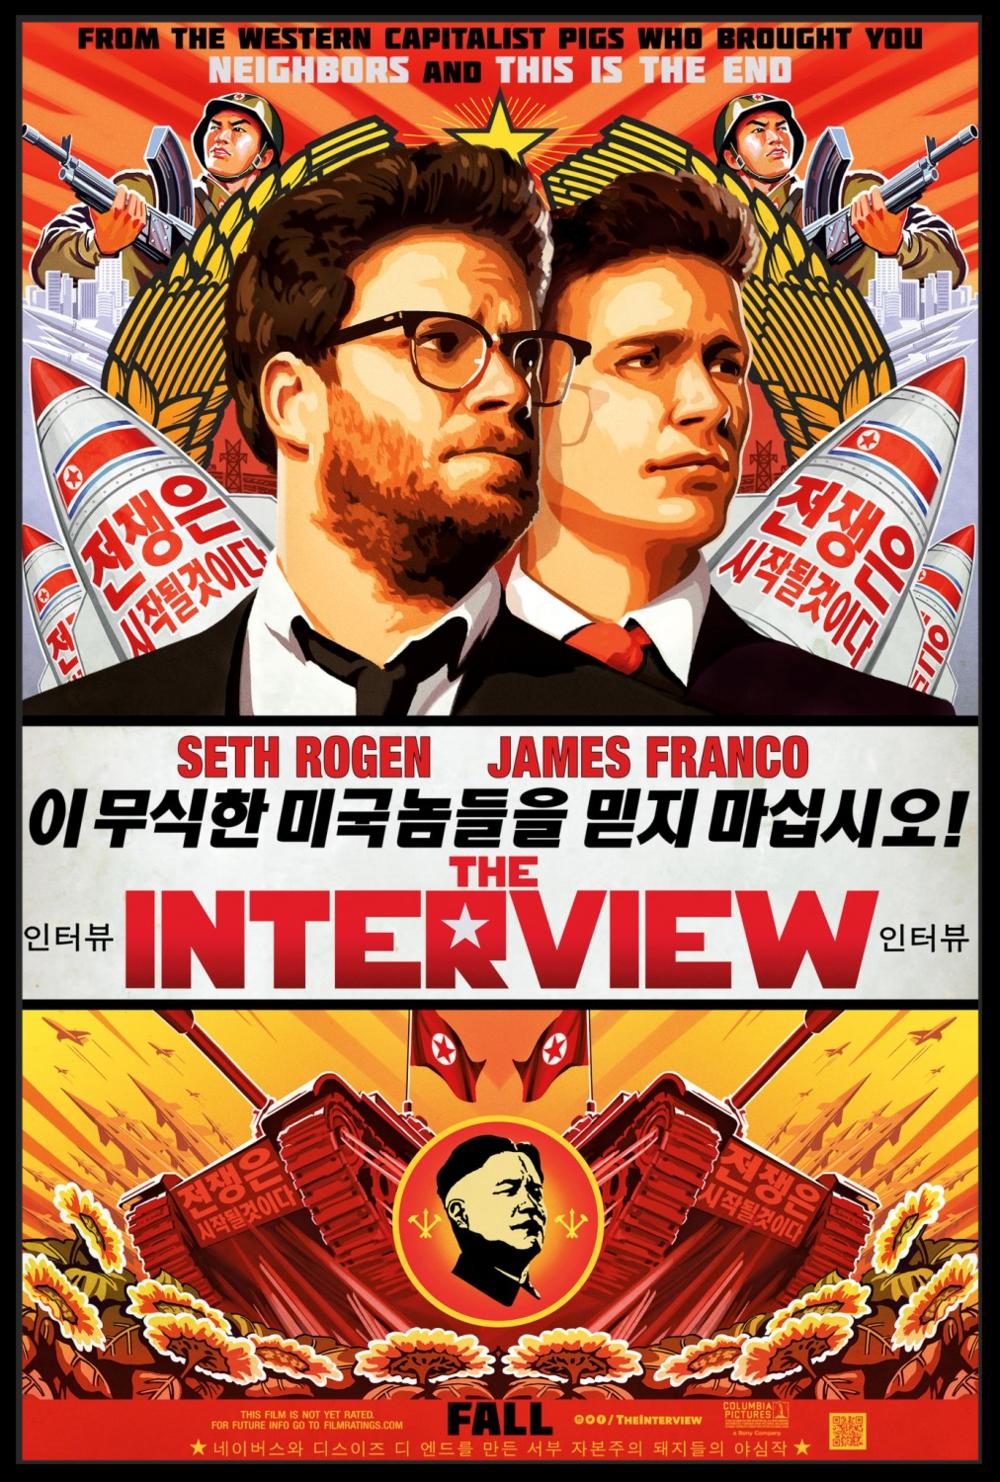 IMDB Watch Trailer